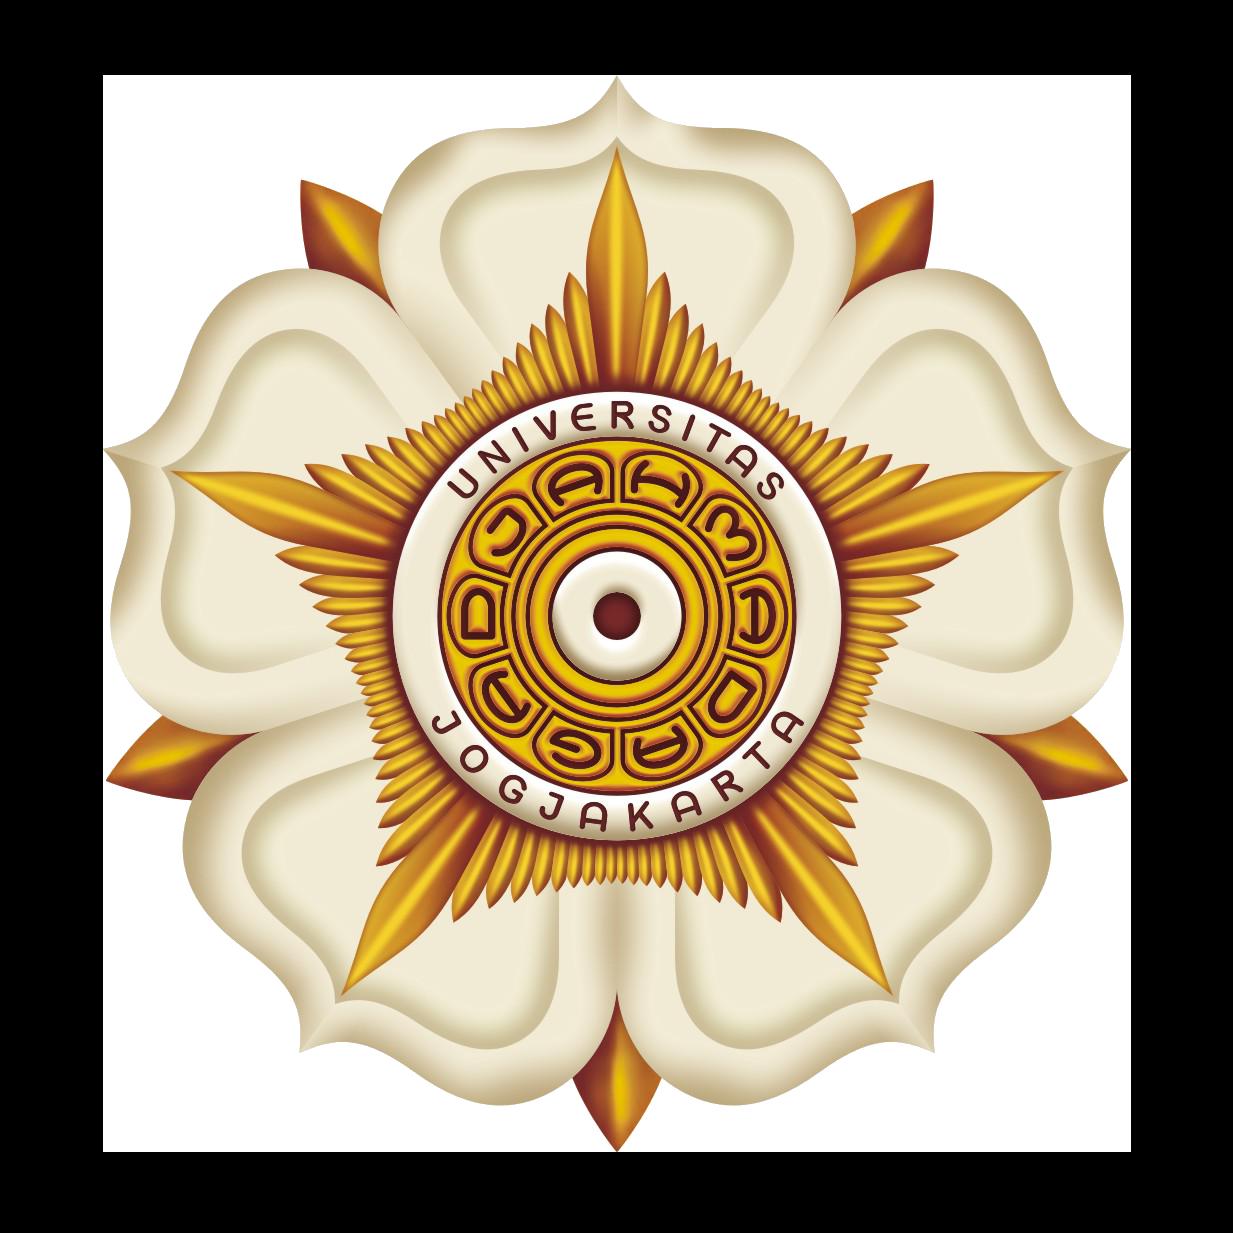 Logo_Universitas_Gadjah_Mada